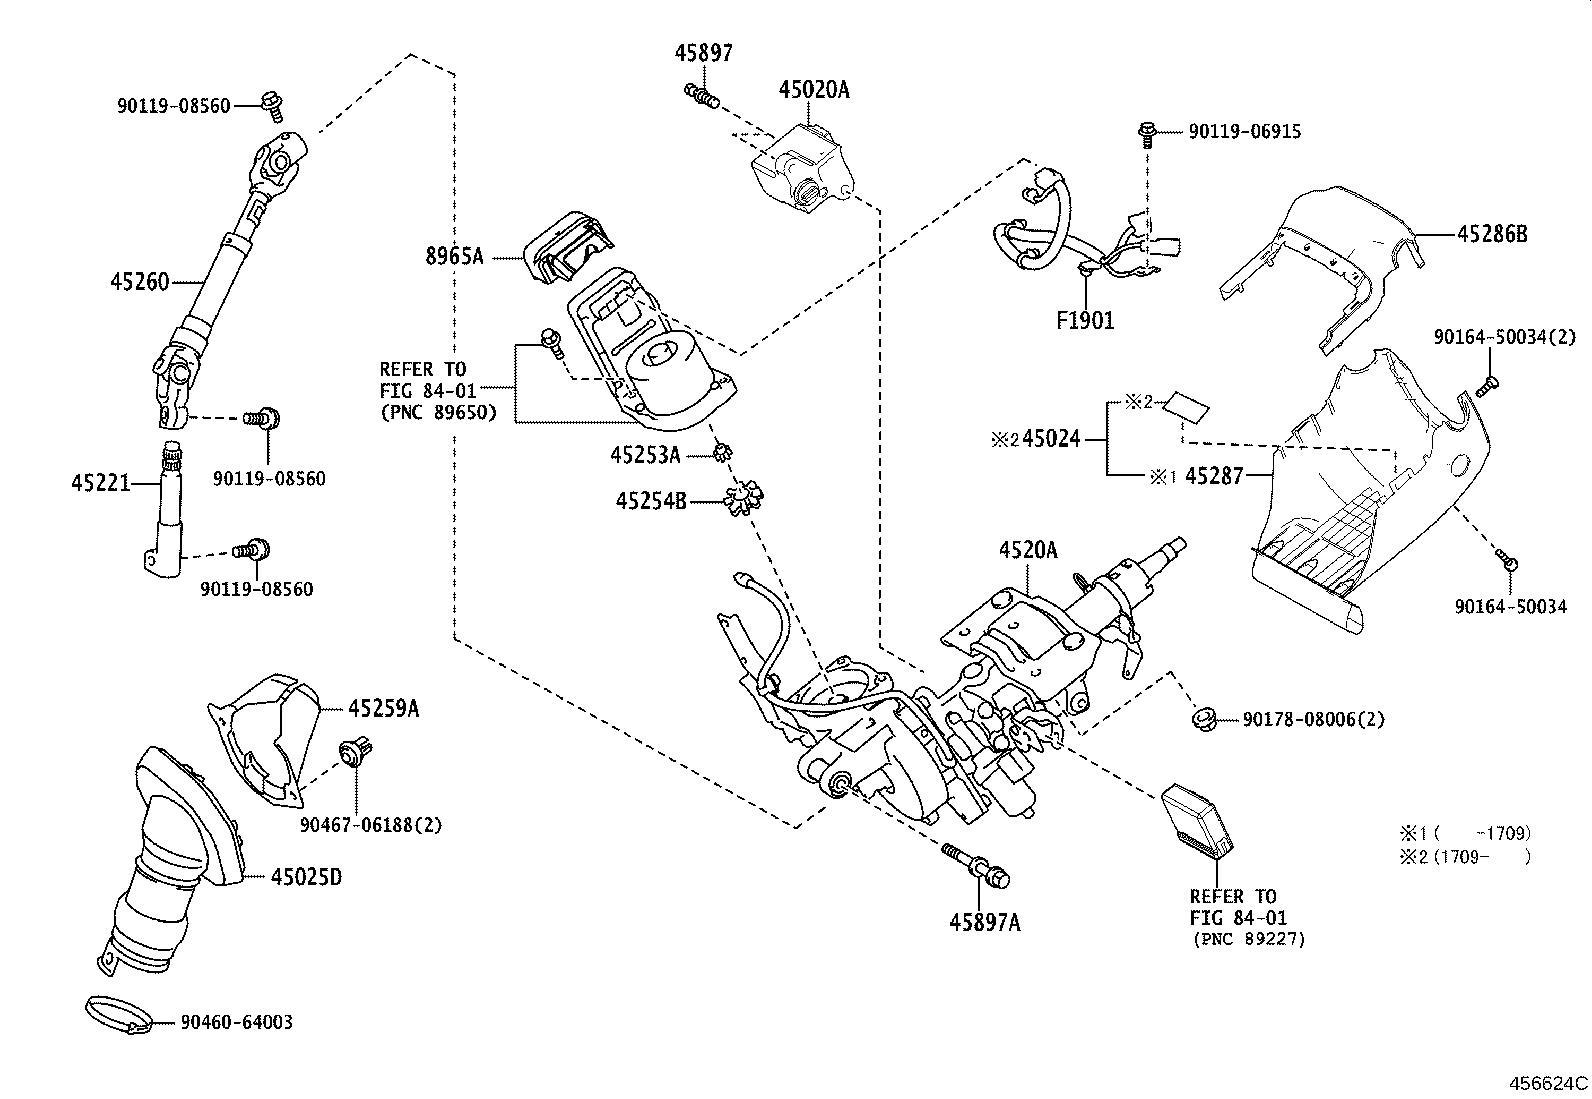 Lexus NX 200t Steering Column Wiring Harness. Wire